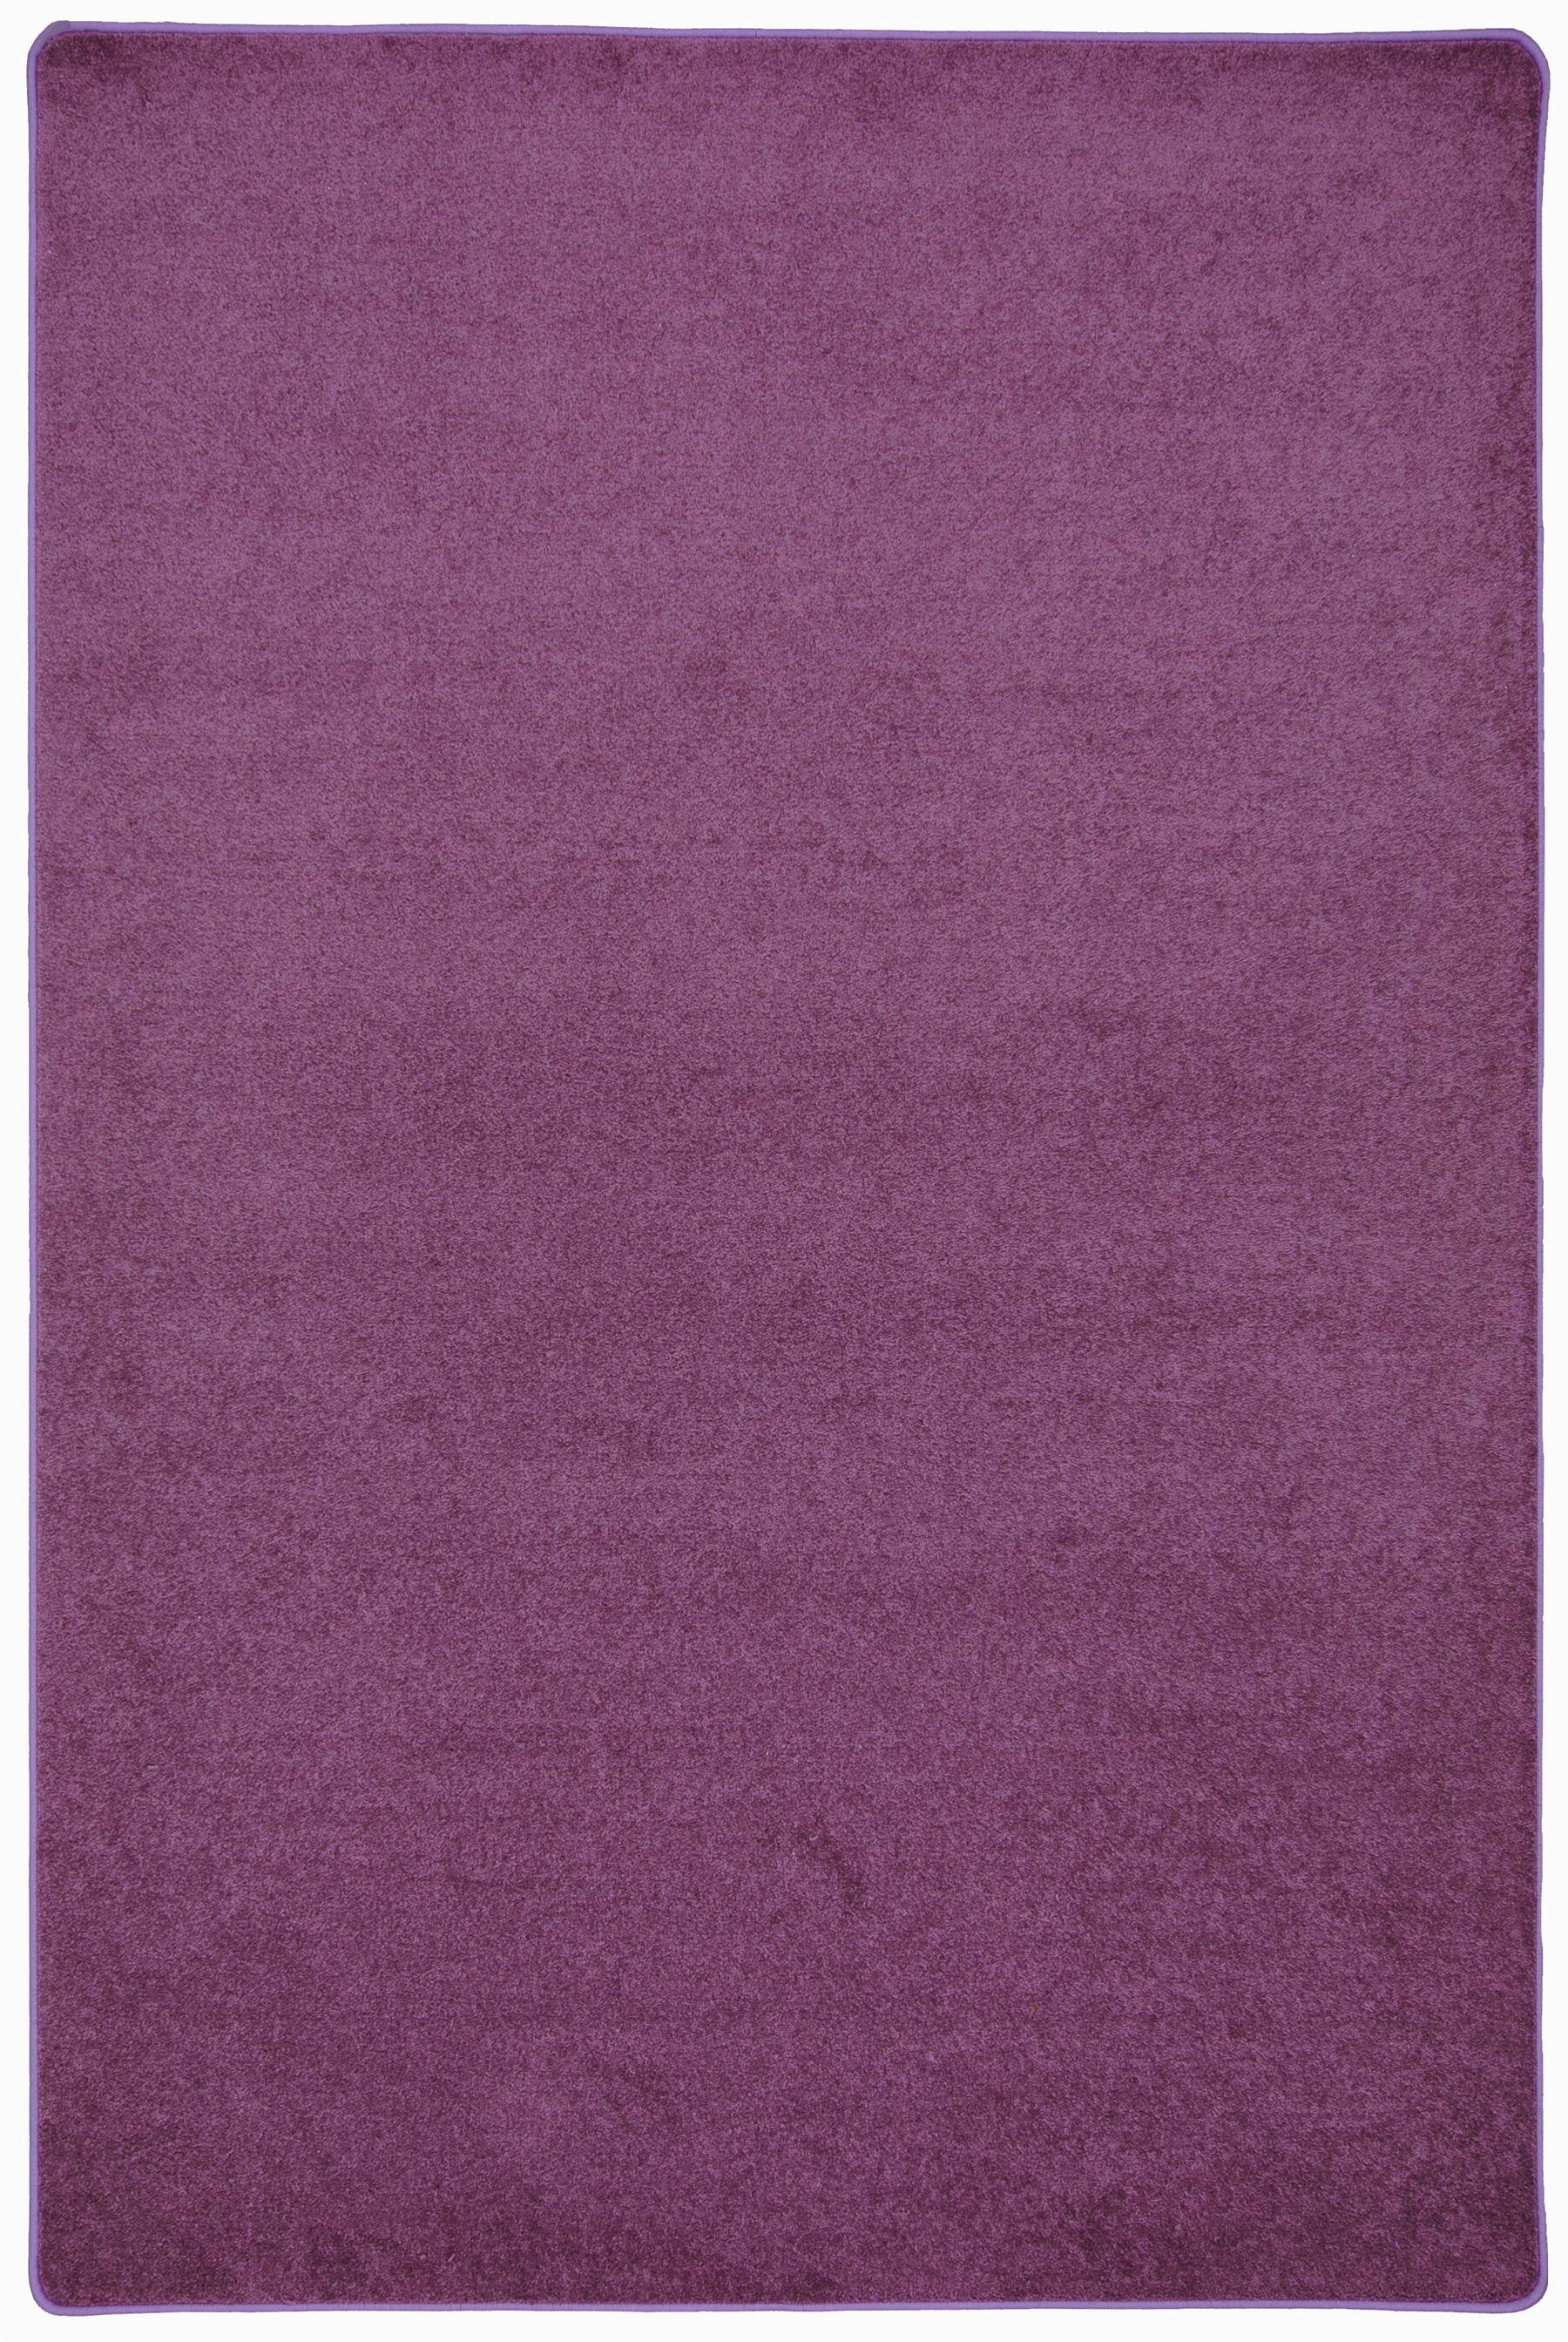 Purple Area Rug Rug Size: Rectangle 12' x 15'